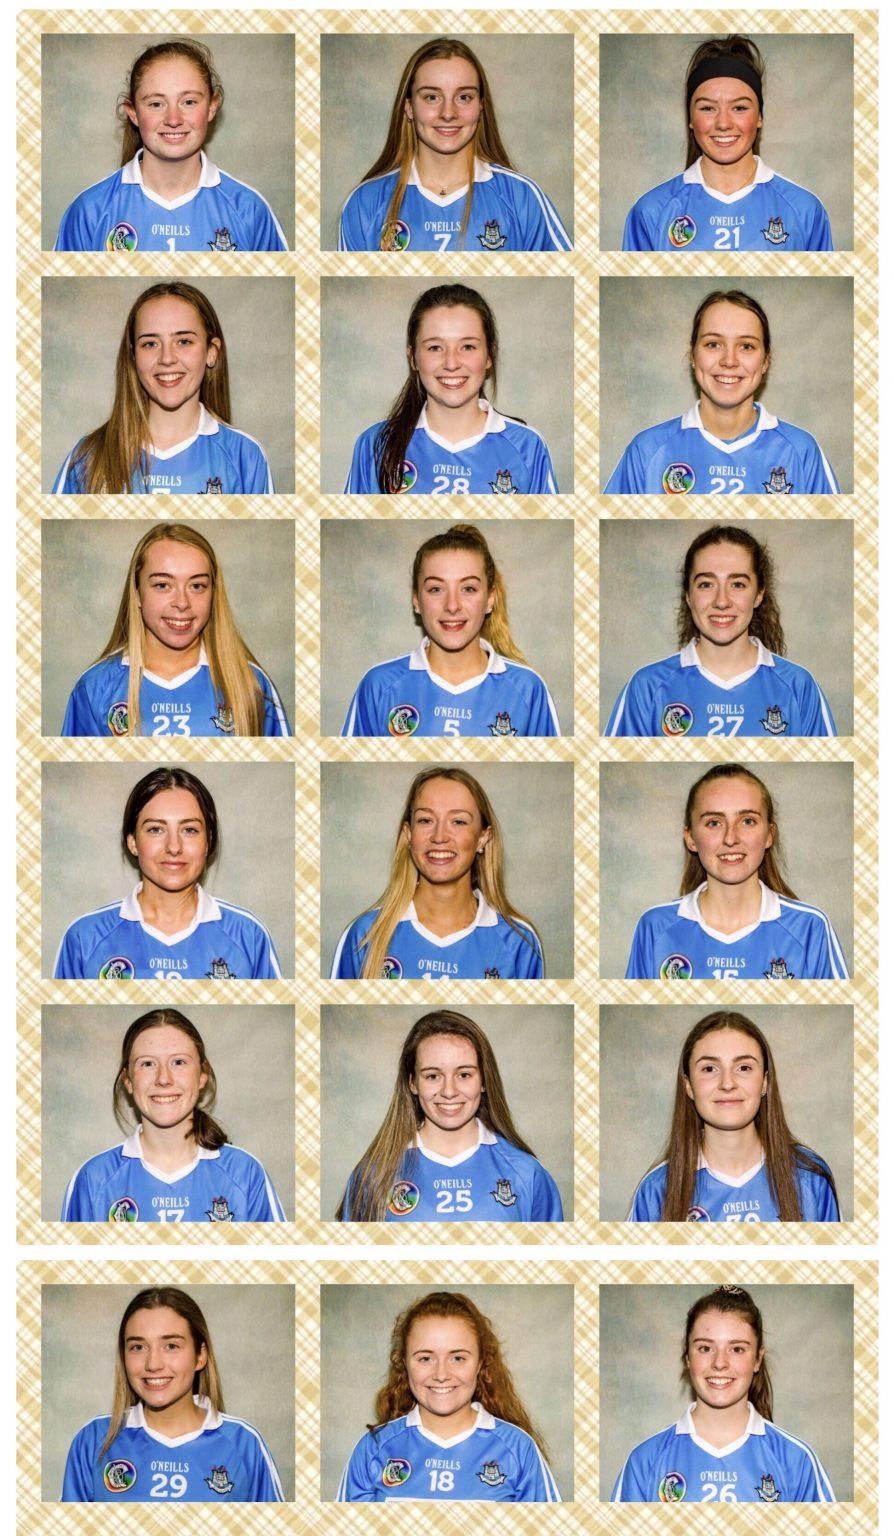 Head shots of the Dublin Camogie Minor Squad In sky blue jerseys